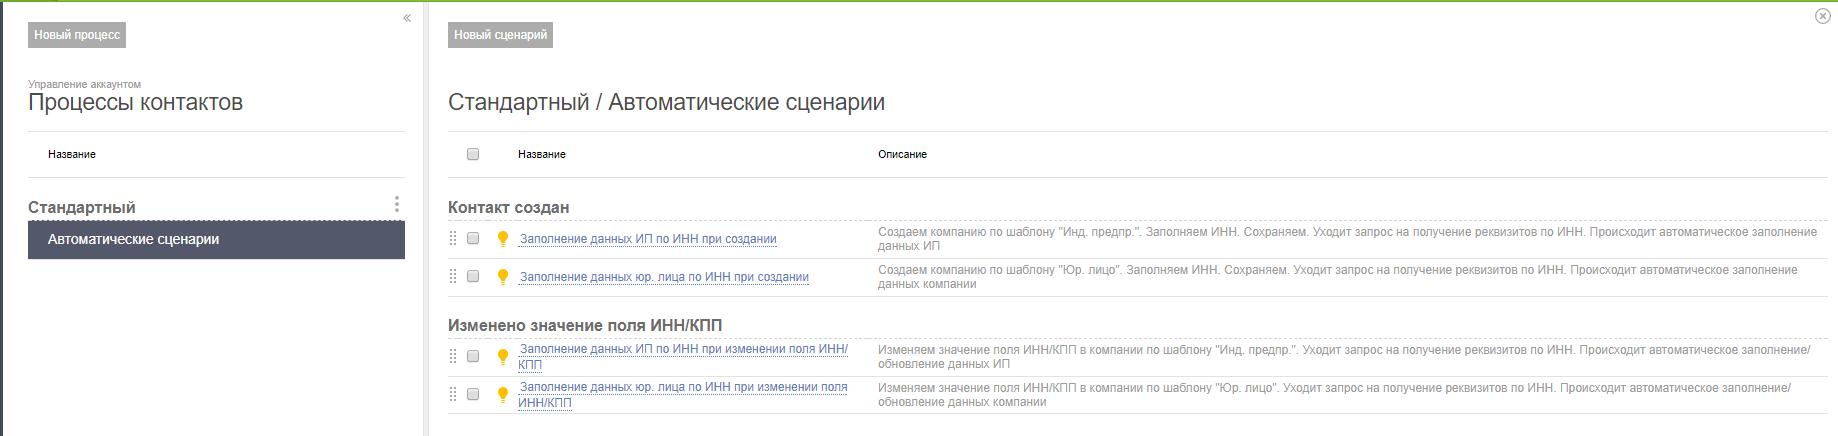 Сценарии хаполнения ИНН/КПП в ПланФиксе